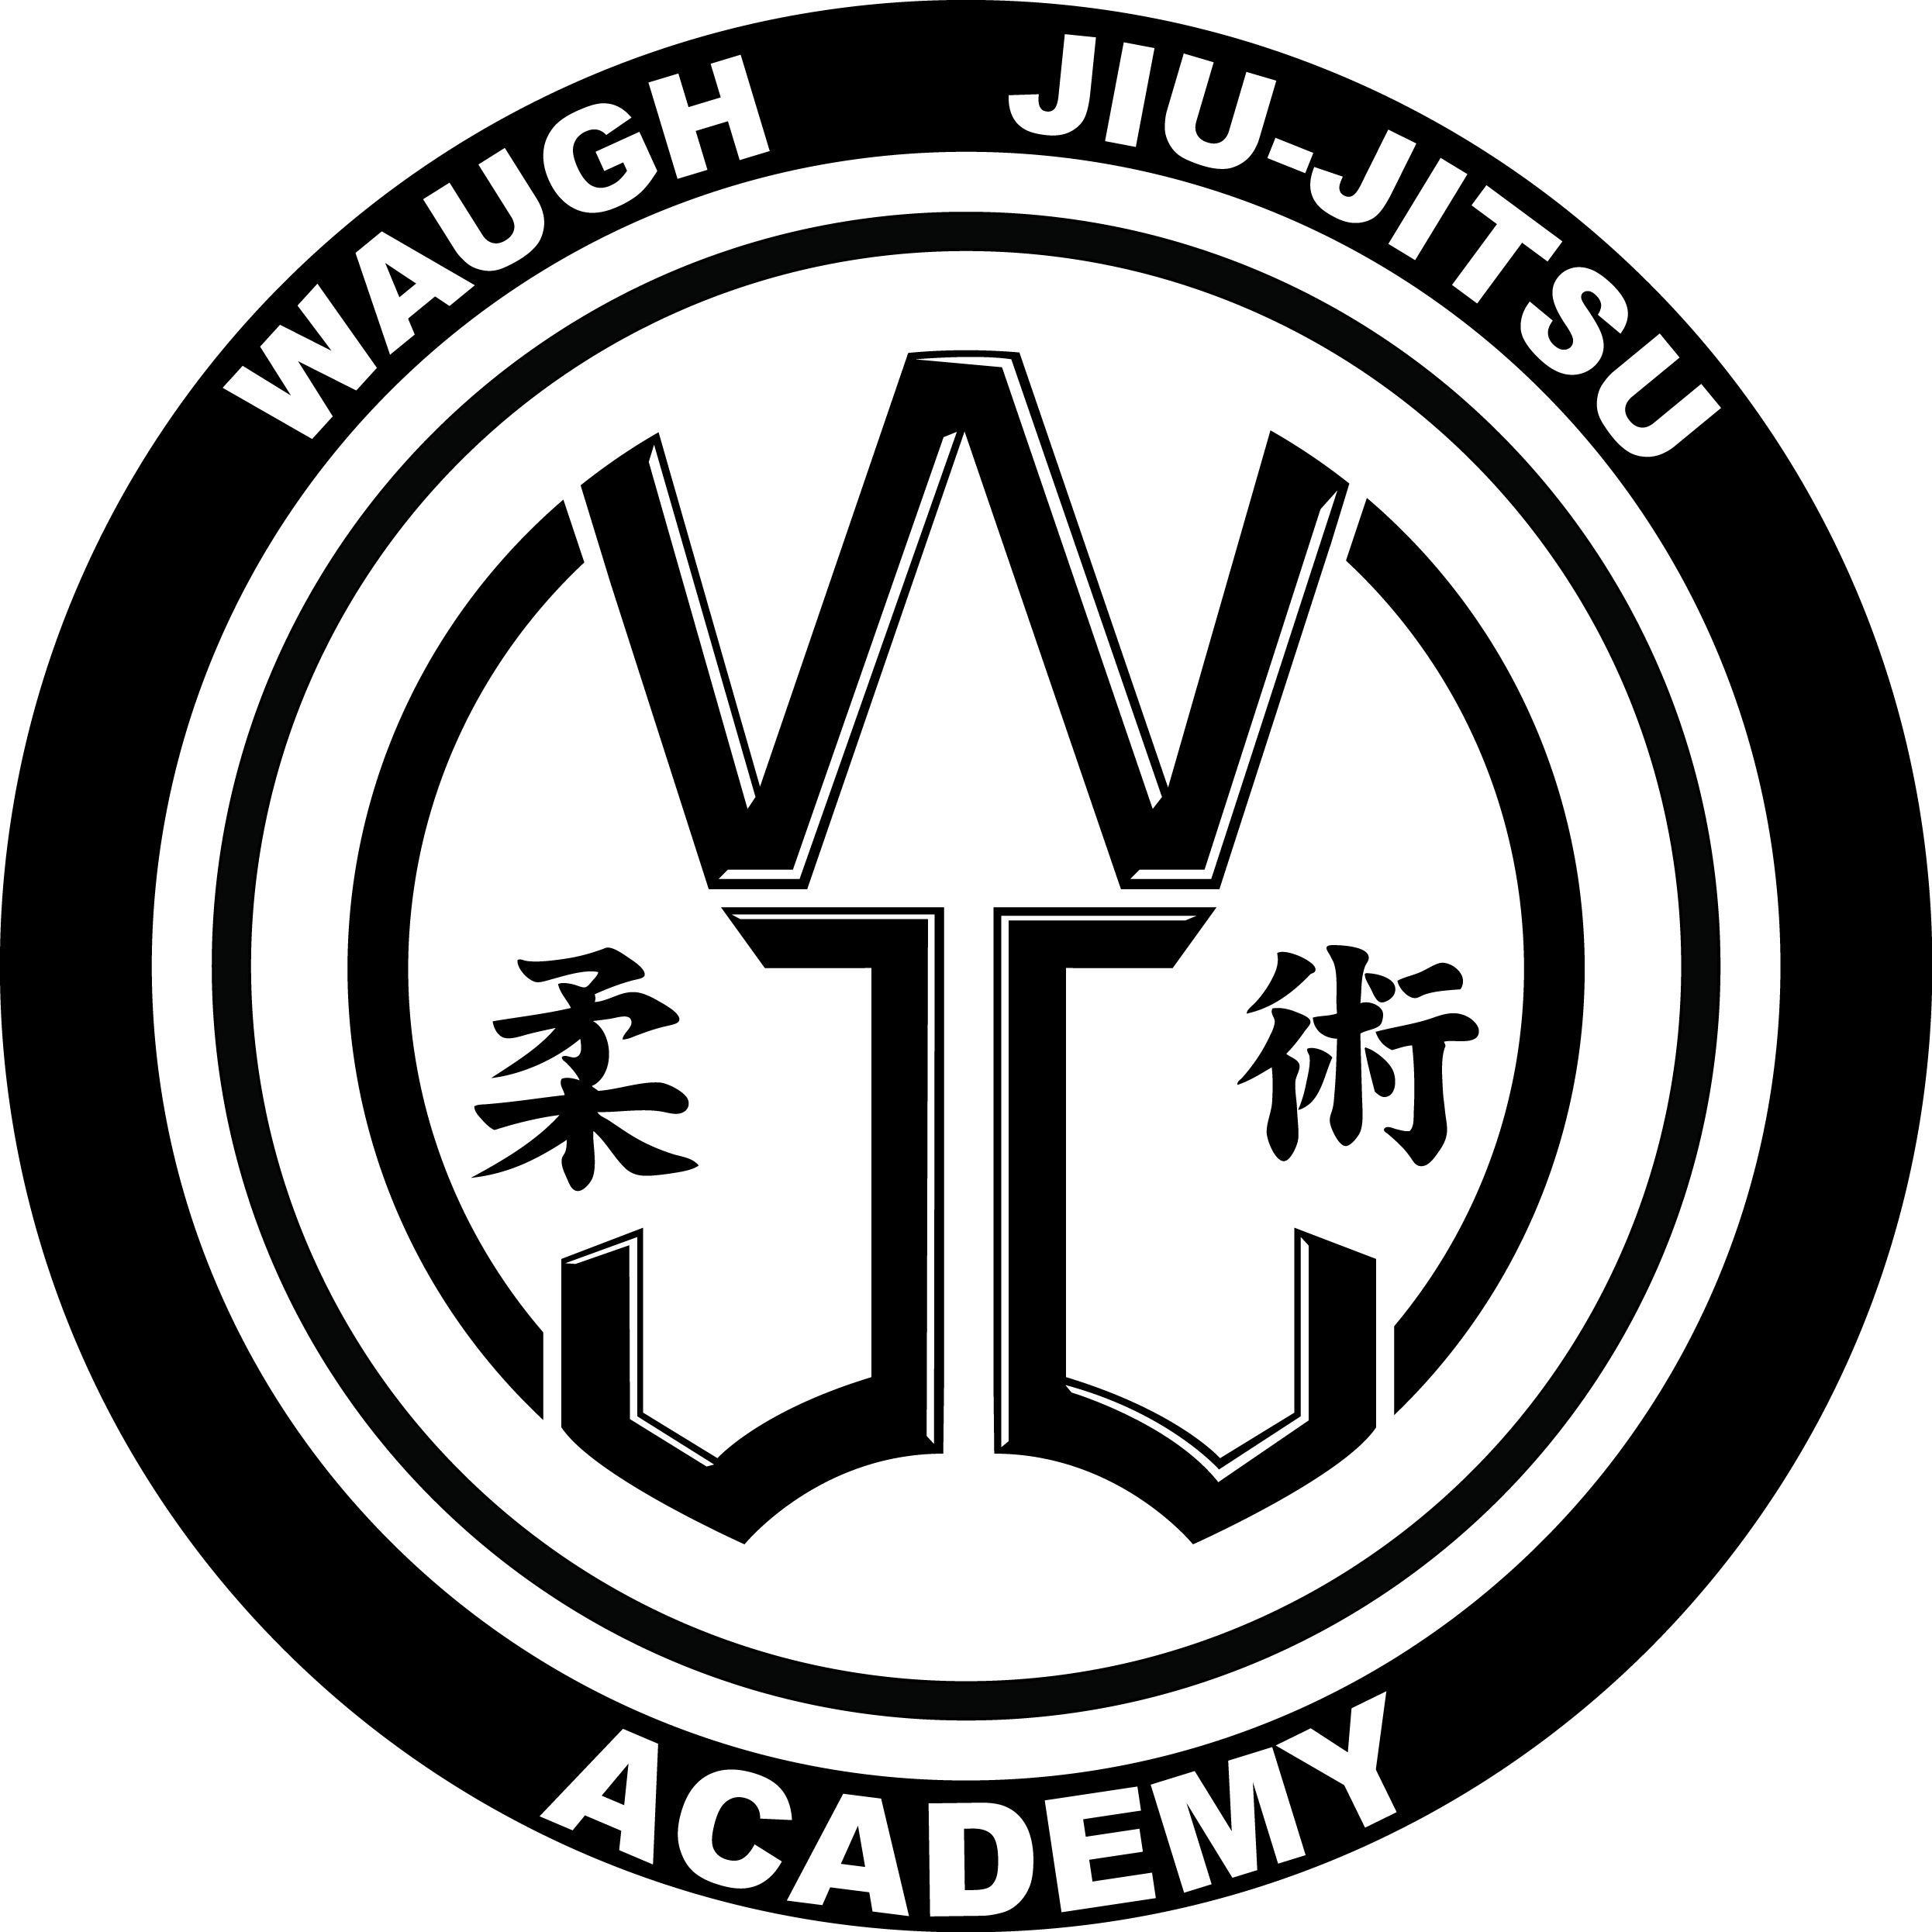 Waugh Jiu-Jitsu Academy image 5